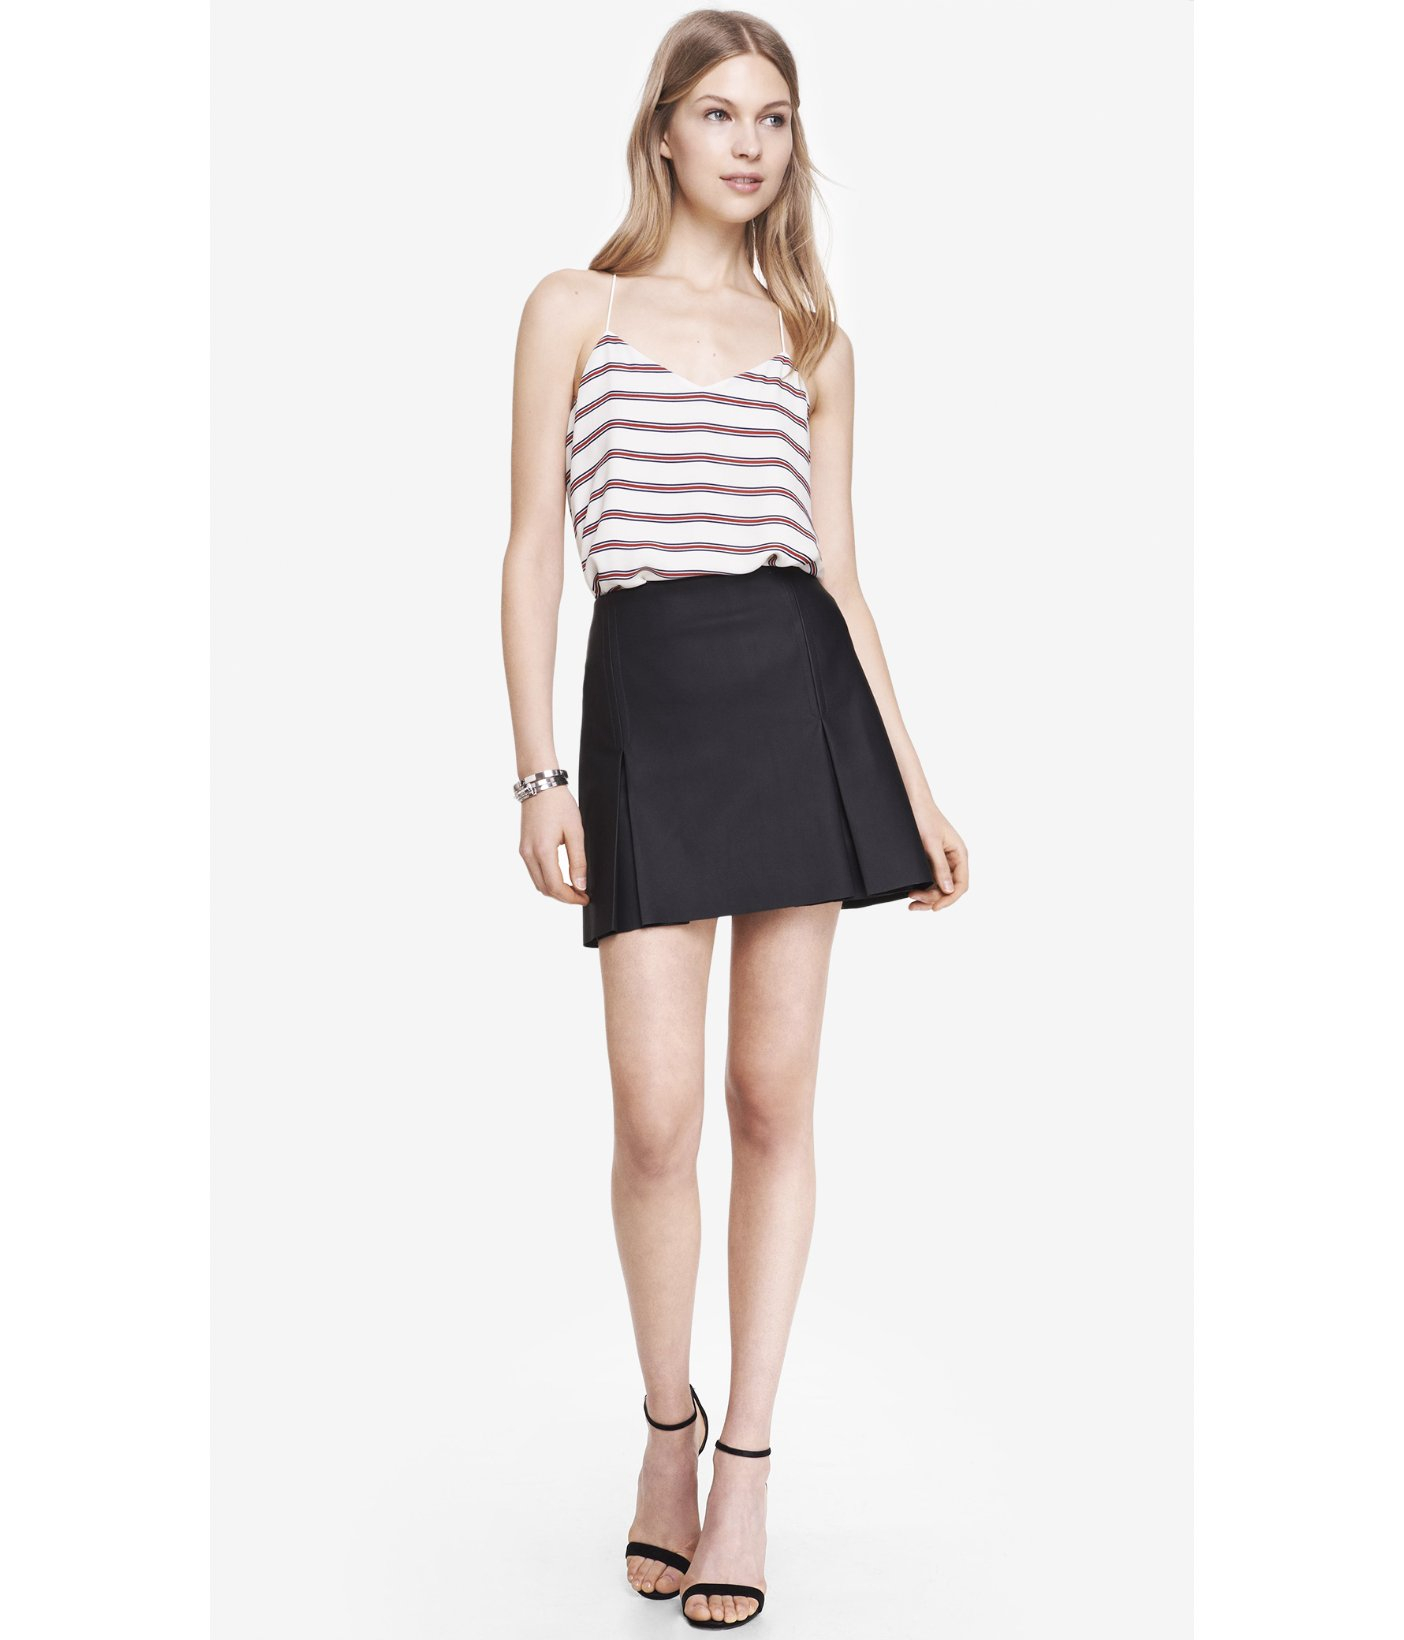 Black A Line Mini Skirt Photo Album - The Fashions Of Paradise